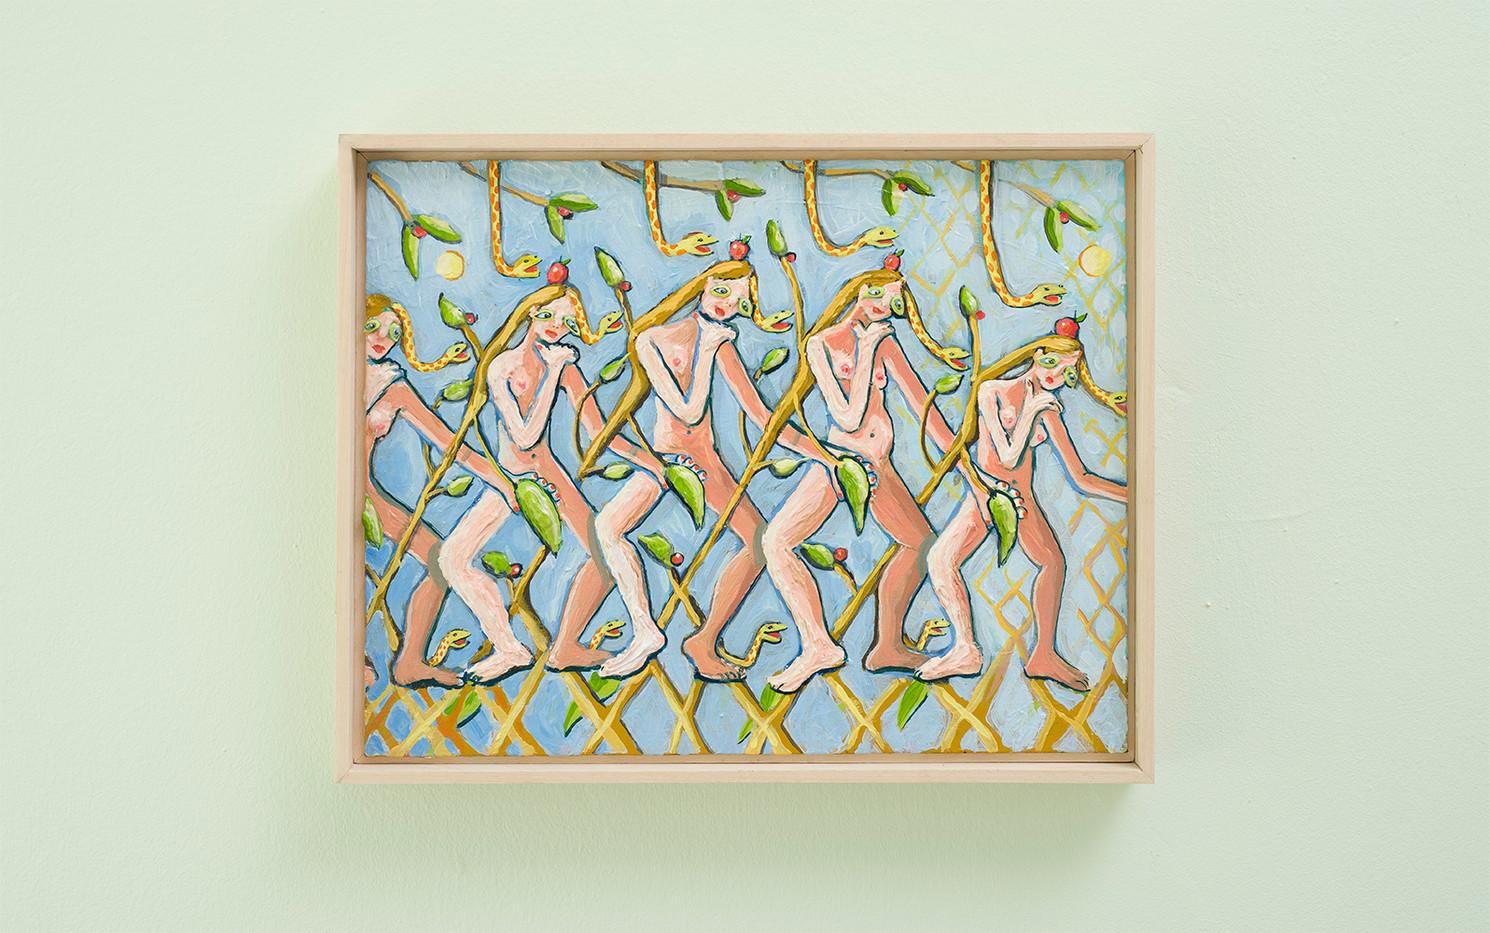 Marlene Steyn | Leaves of the Eves | 2018 | Oil on Canvas Board | 35.5 x 45.5 cm